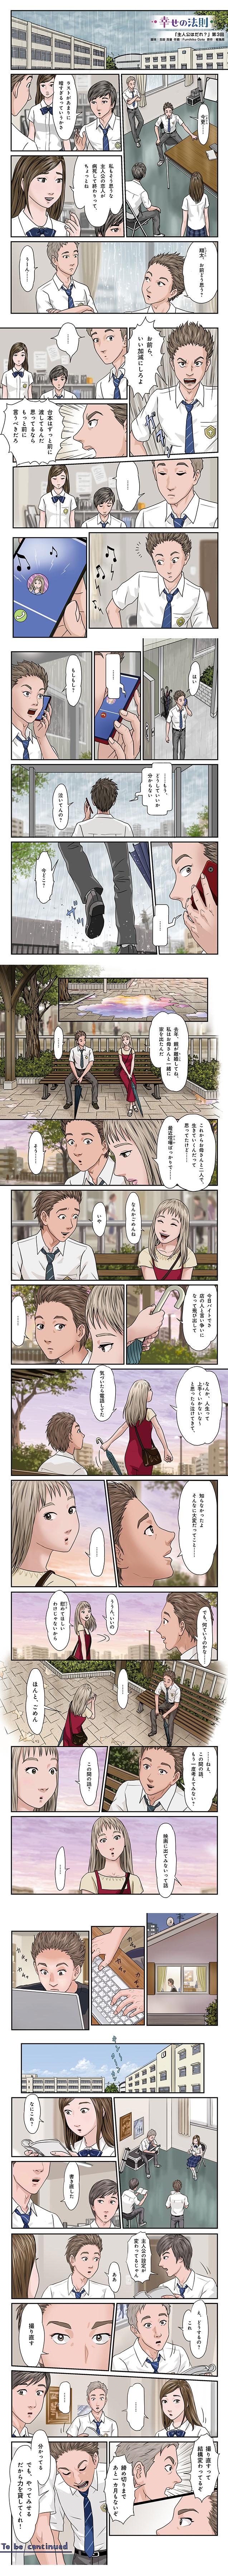 hidokei124_manga_all